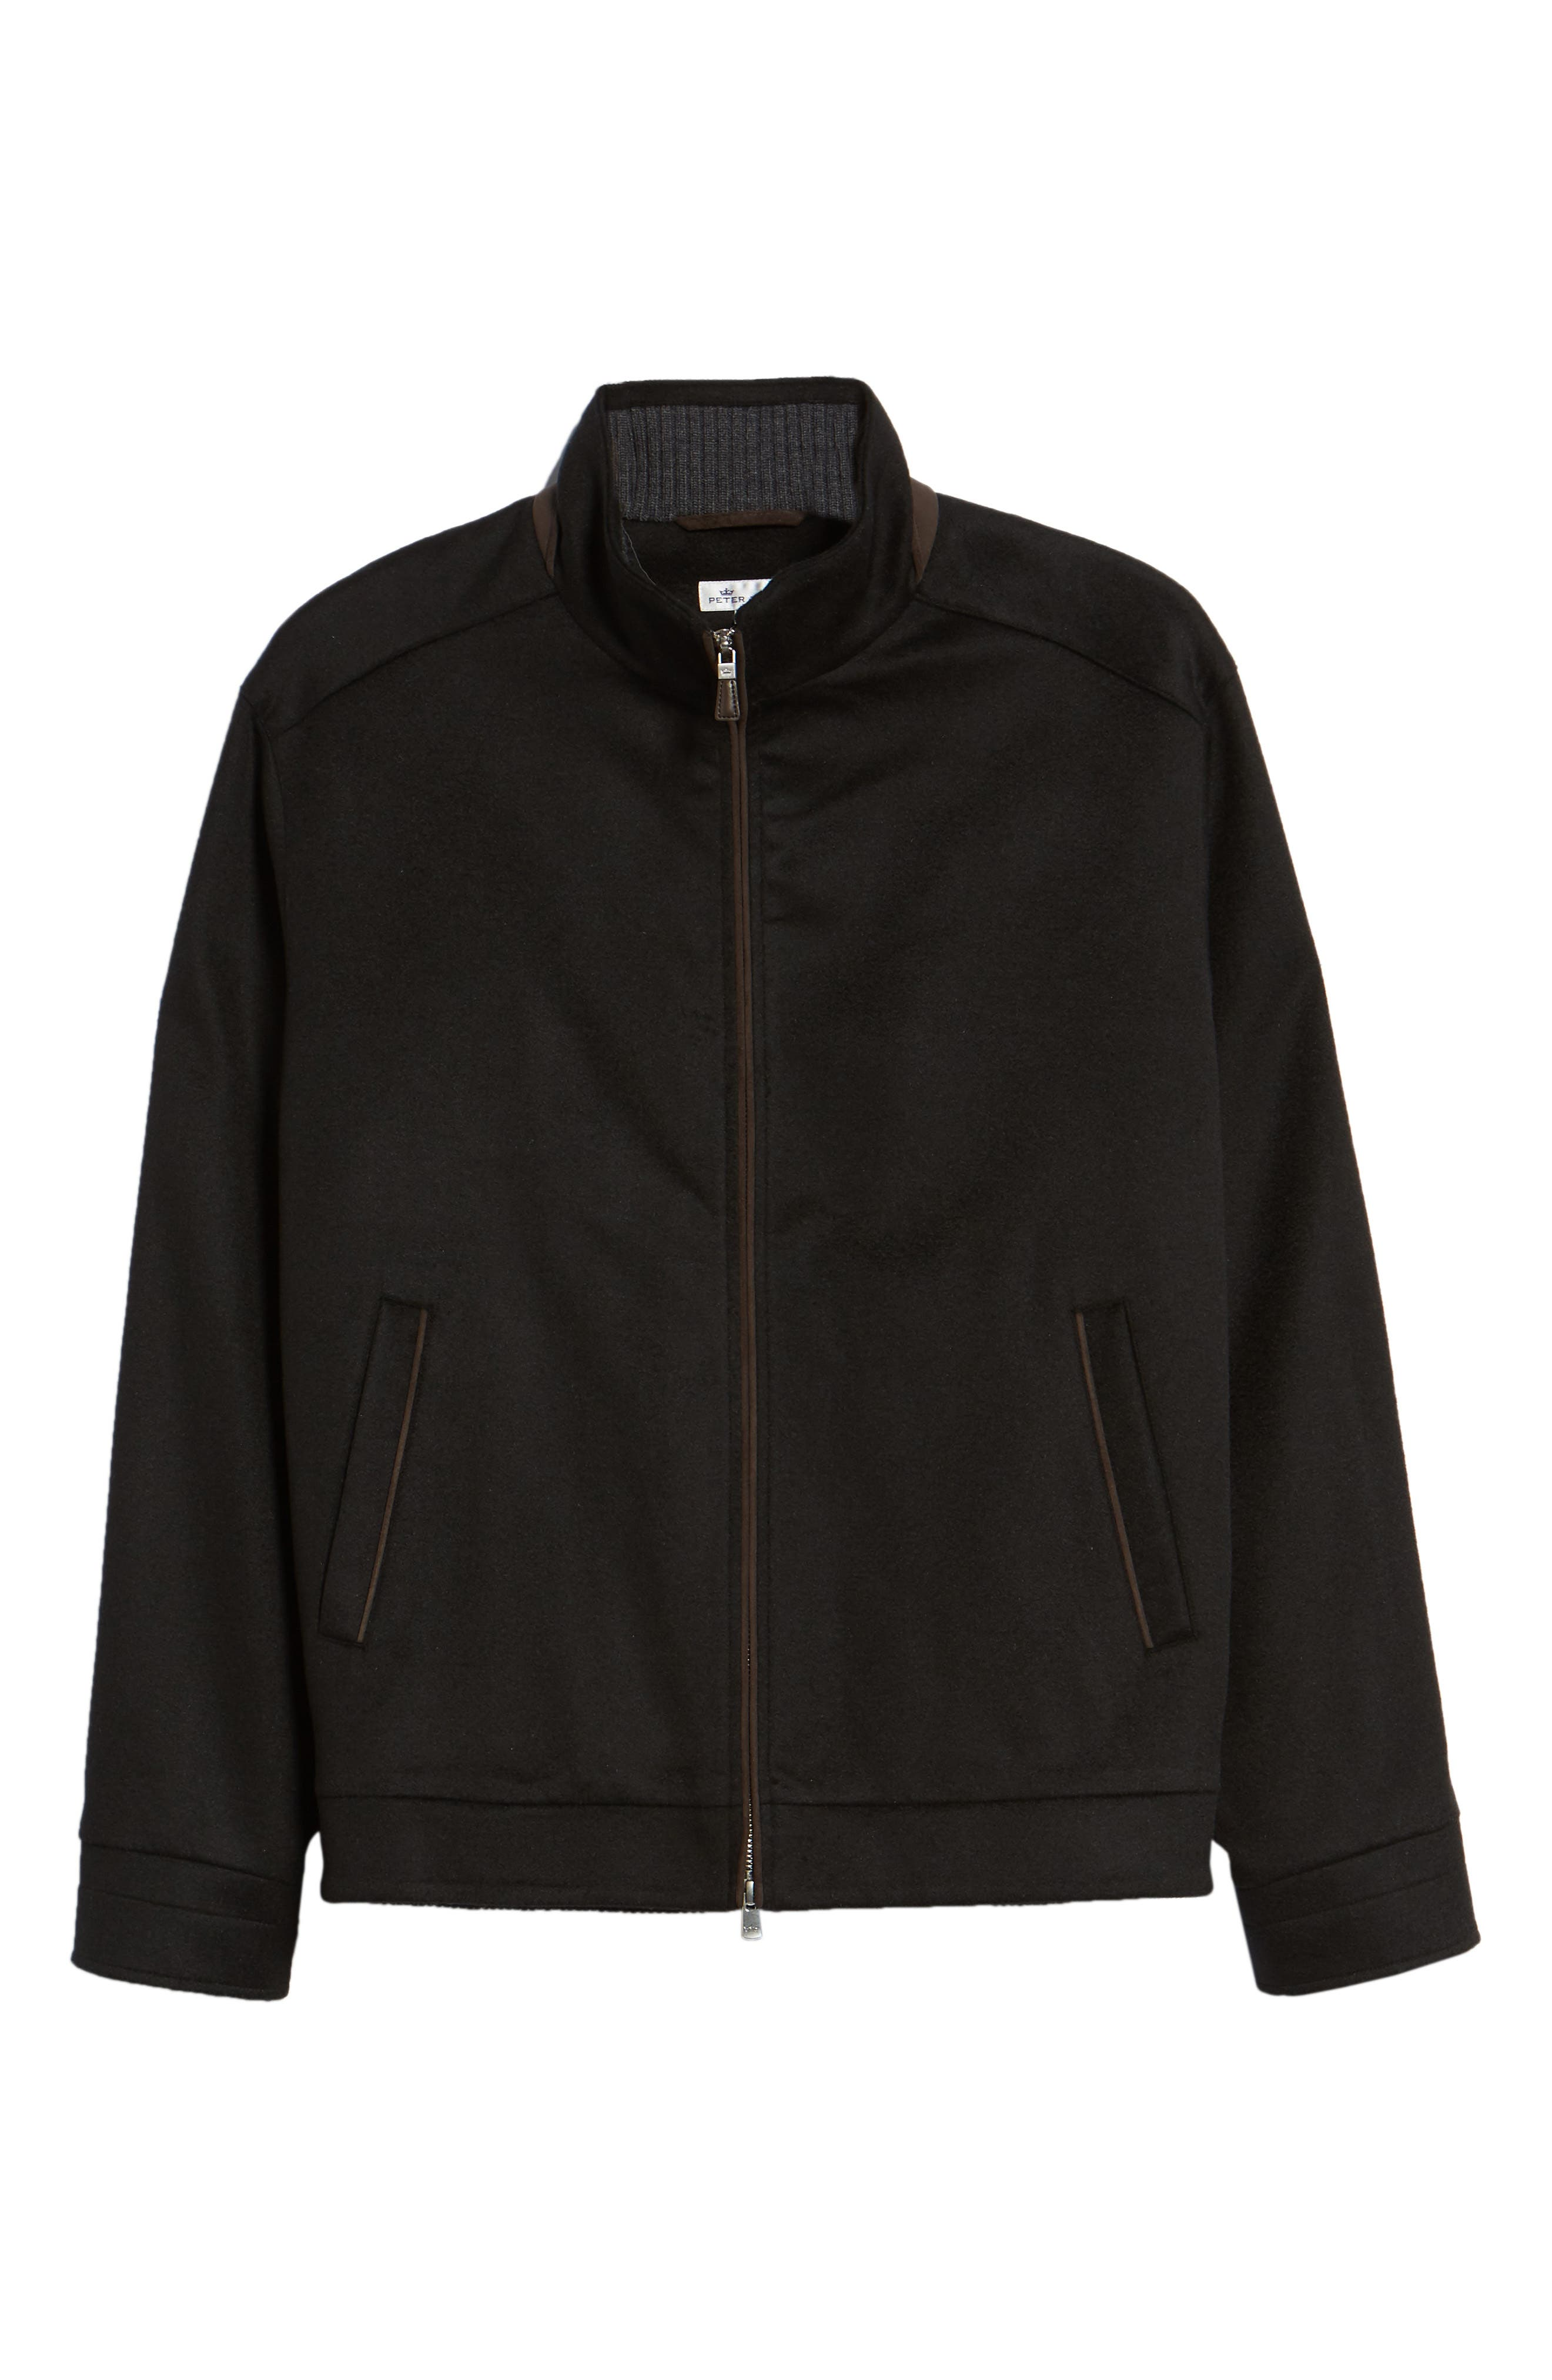 Westport Crown Wool & Cashmere Jacket,                             Alternate thumbnail 6, color,                             001